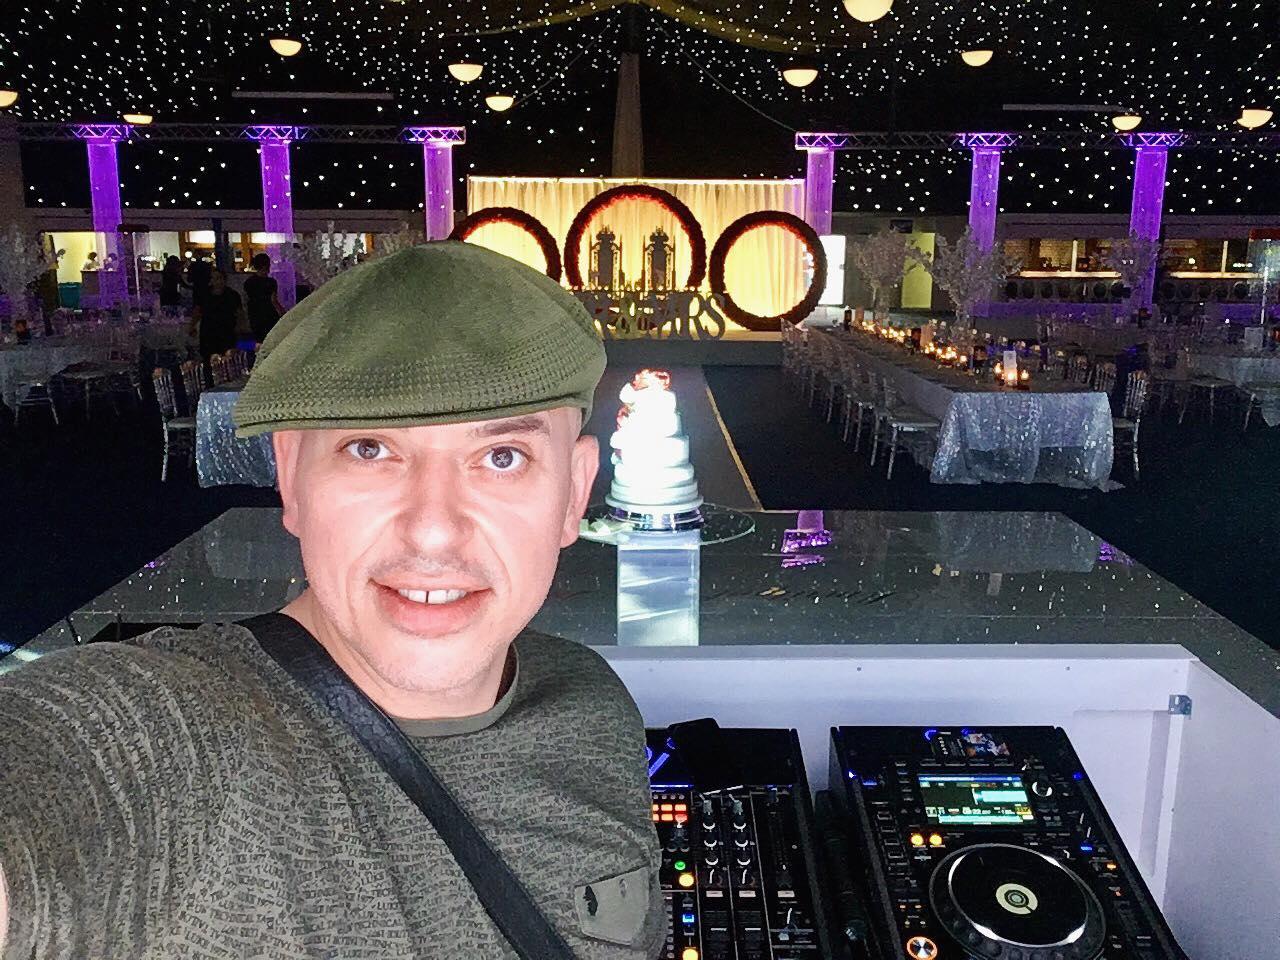 Andy Sax DJ Sunny Jagpal Centenary Pavillion Elland Road Leeds United F.C. Indian Wedding